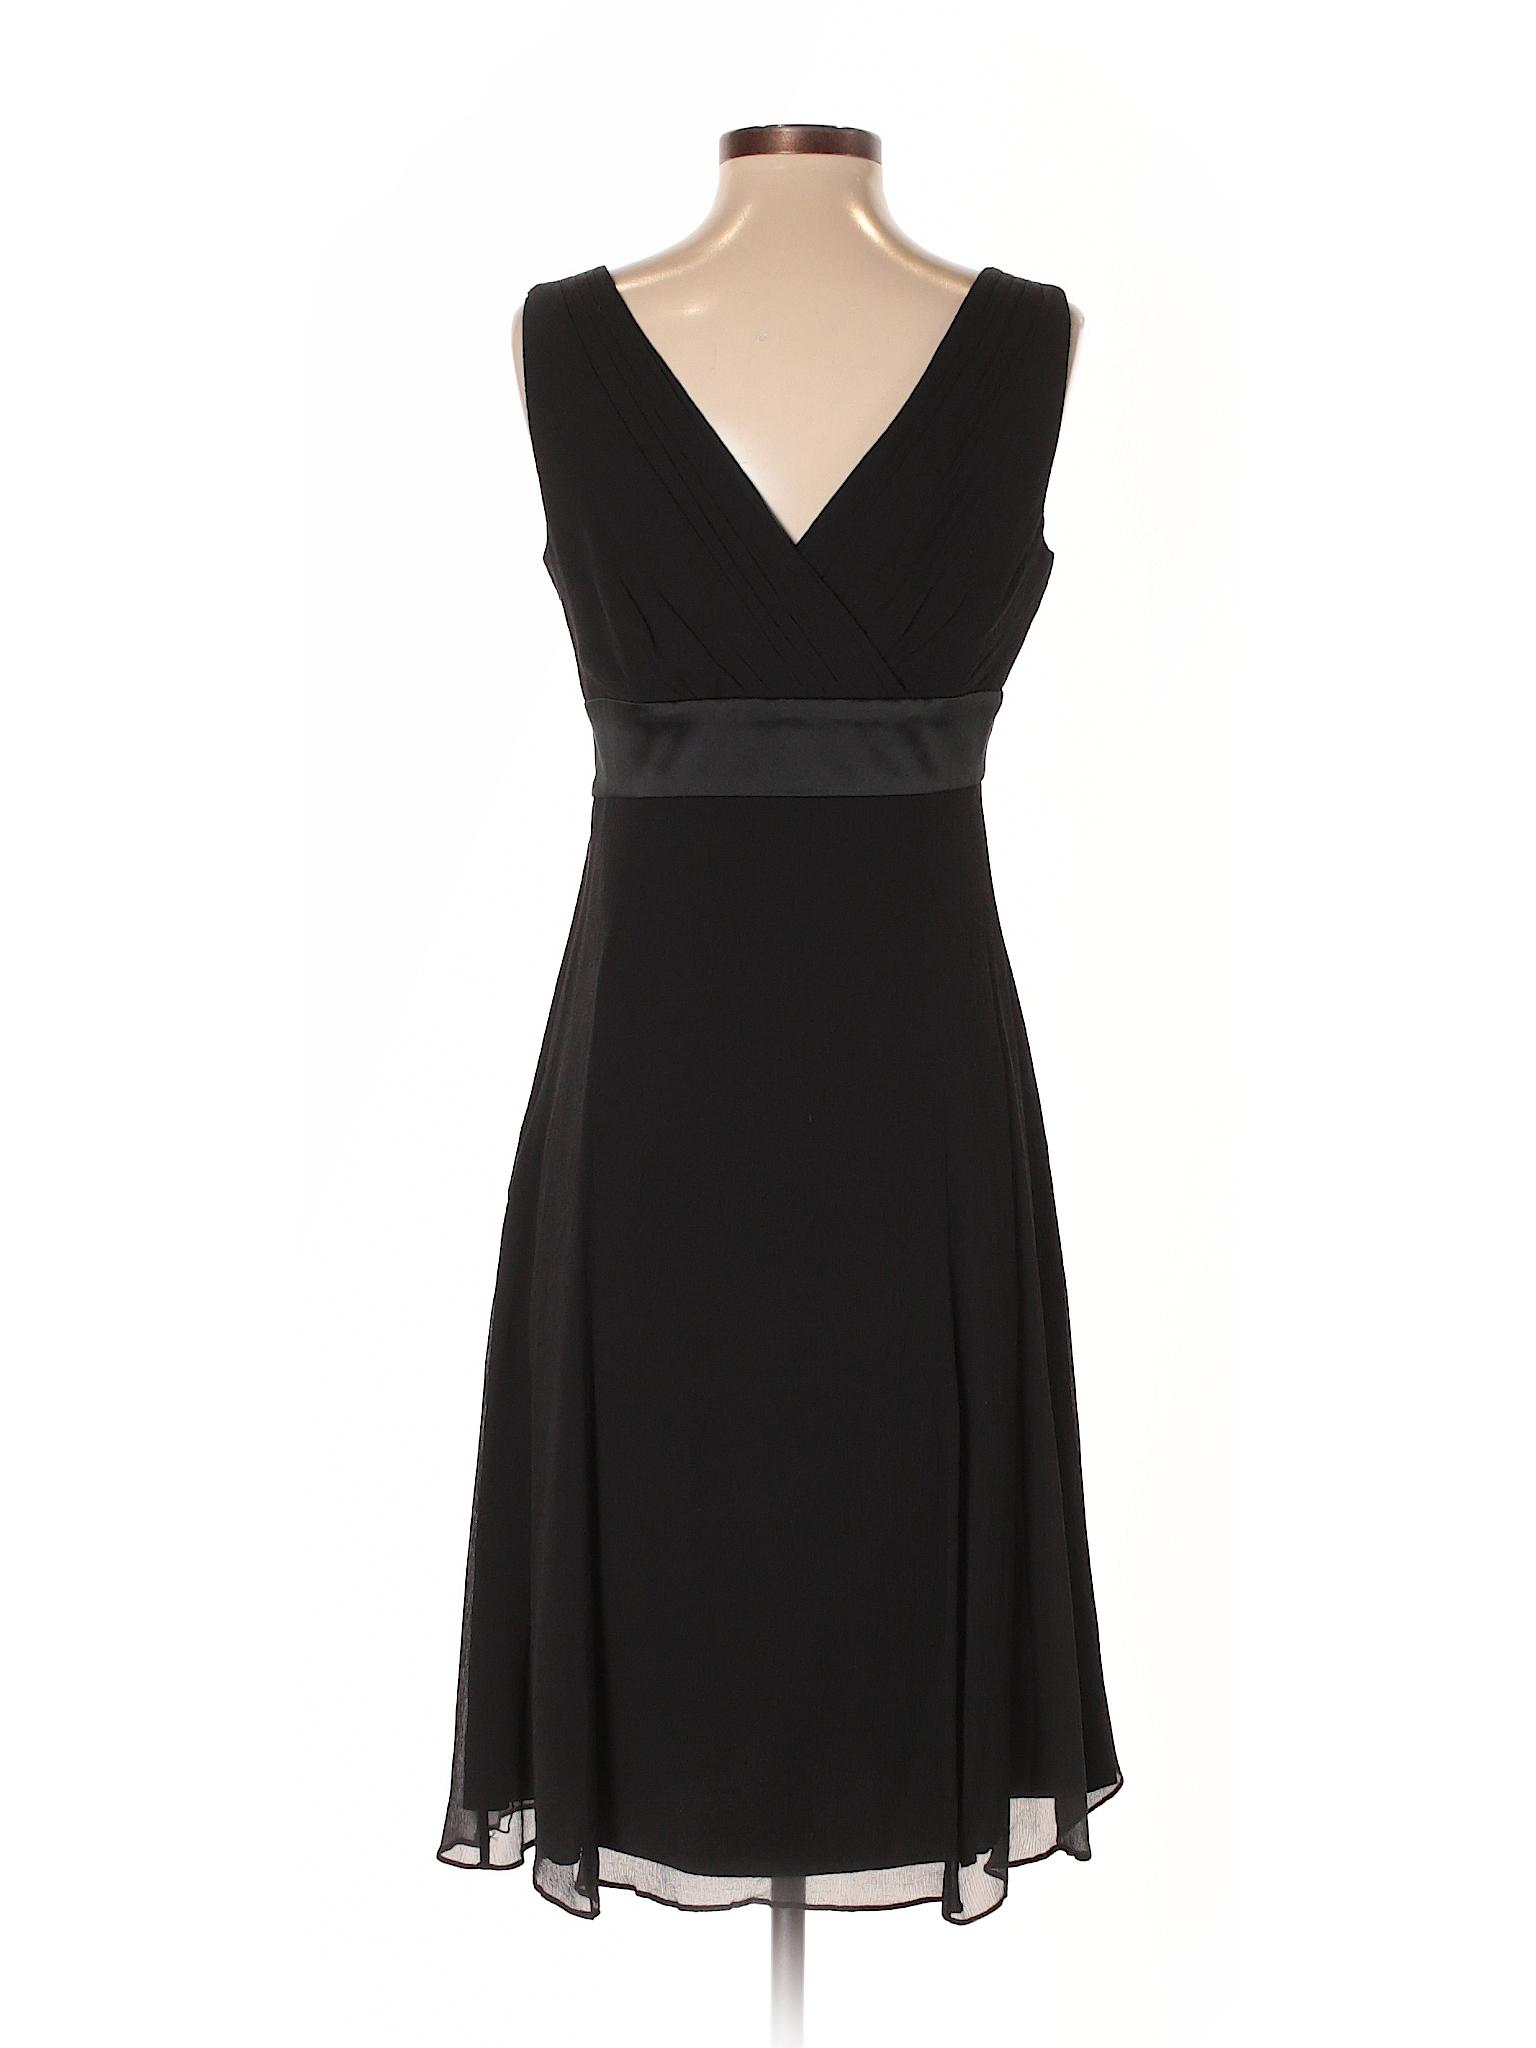 Ann winter Dress Casual Taylor Boutique wXHpq5Cp